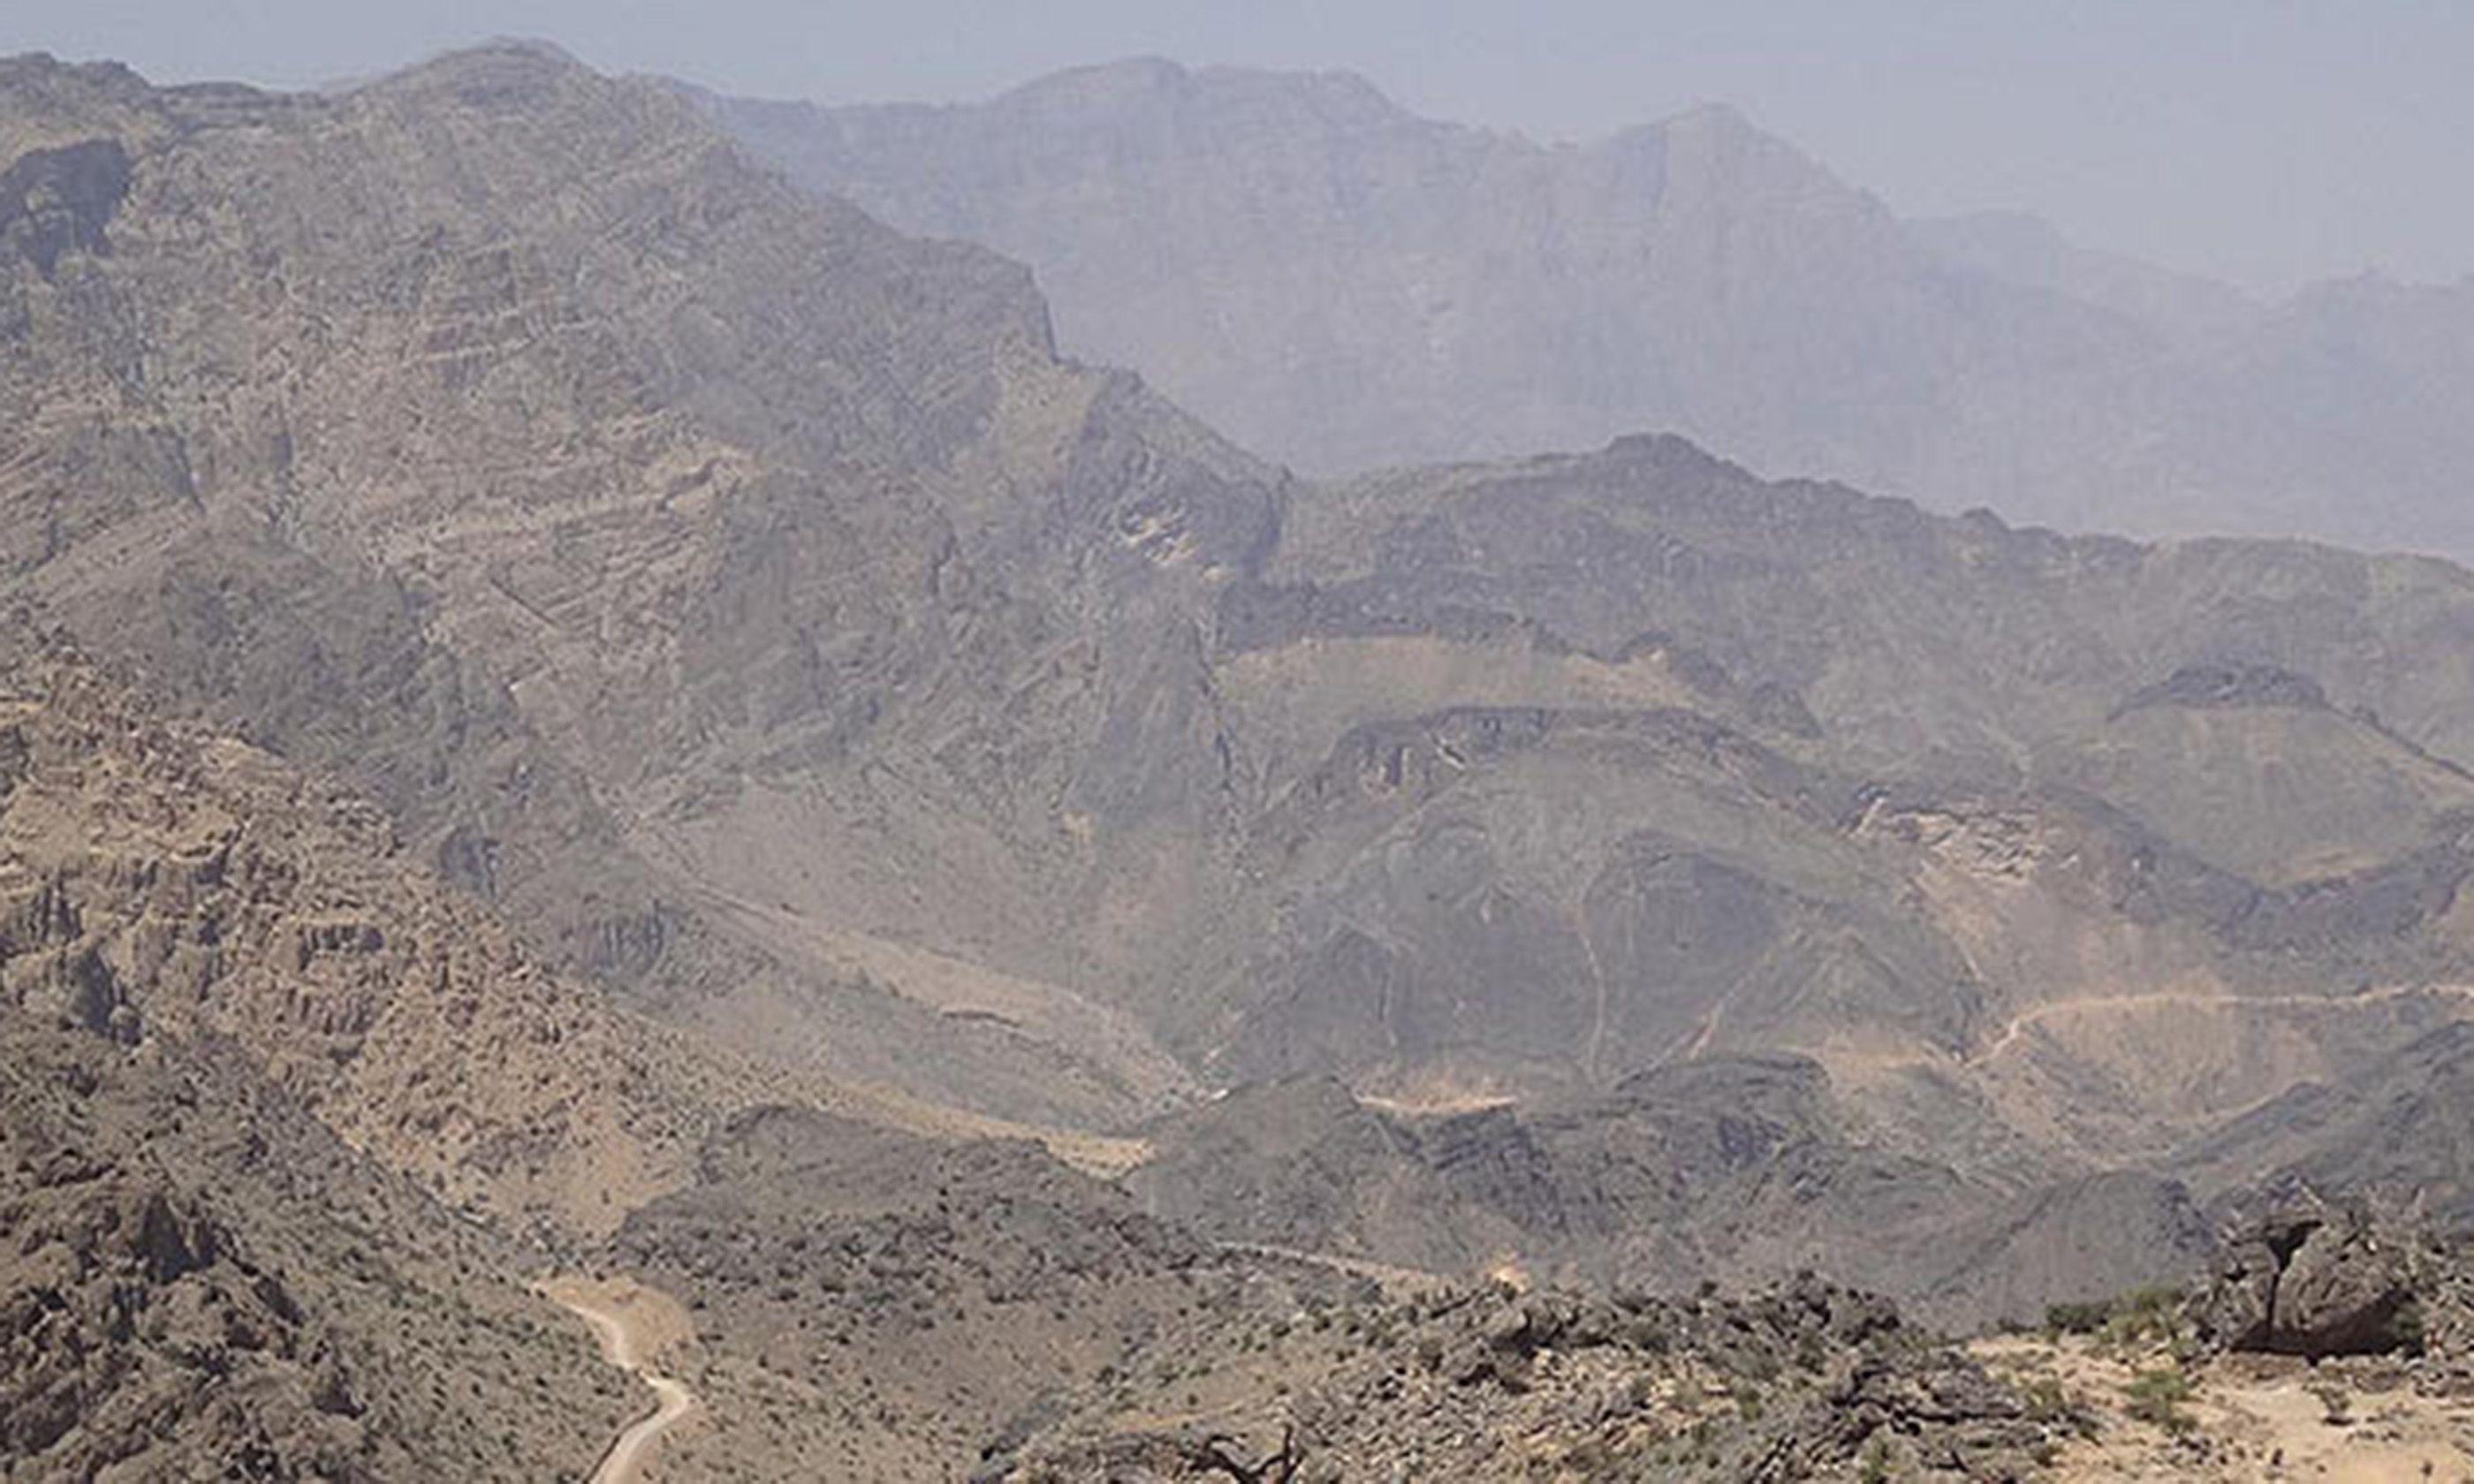 Jebel Akhdar Mountain (Joāo Leitão)